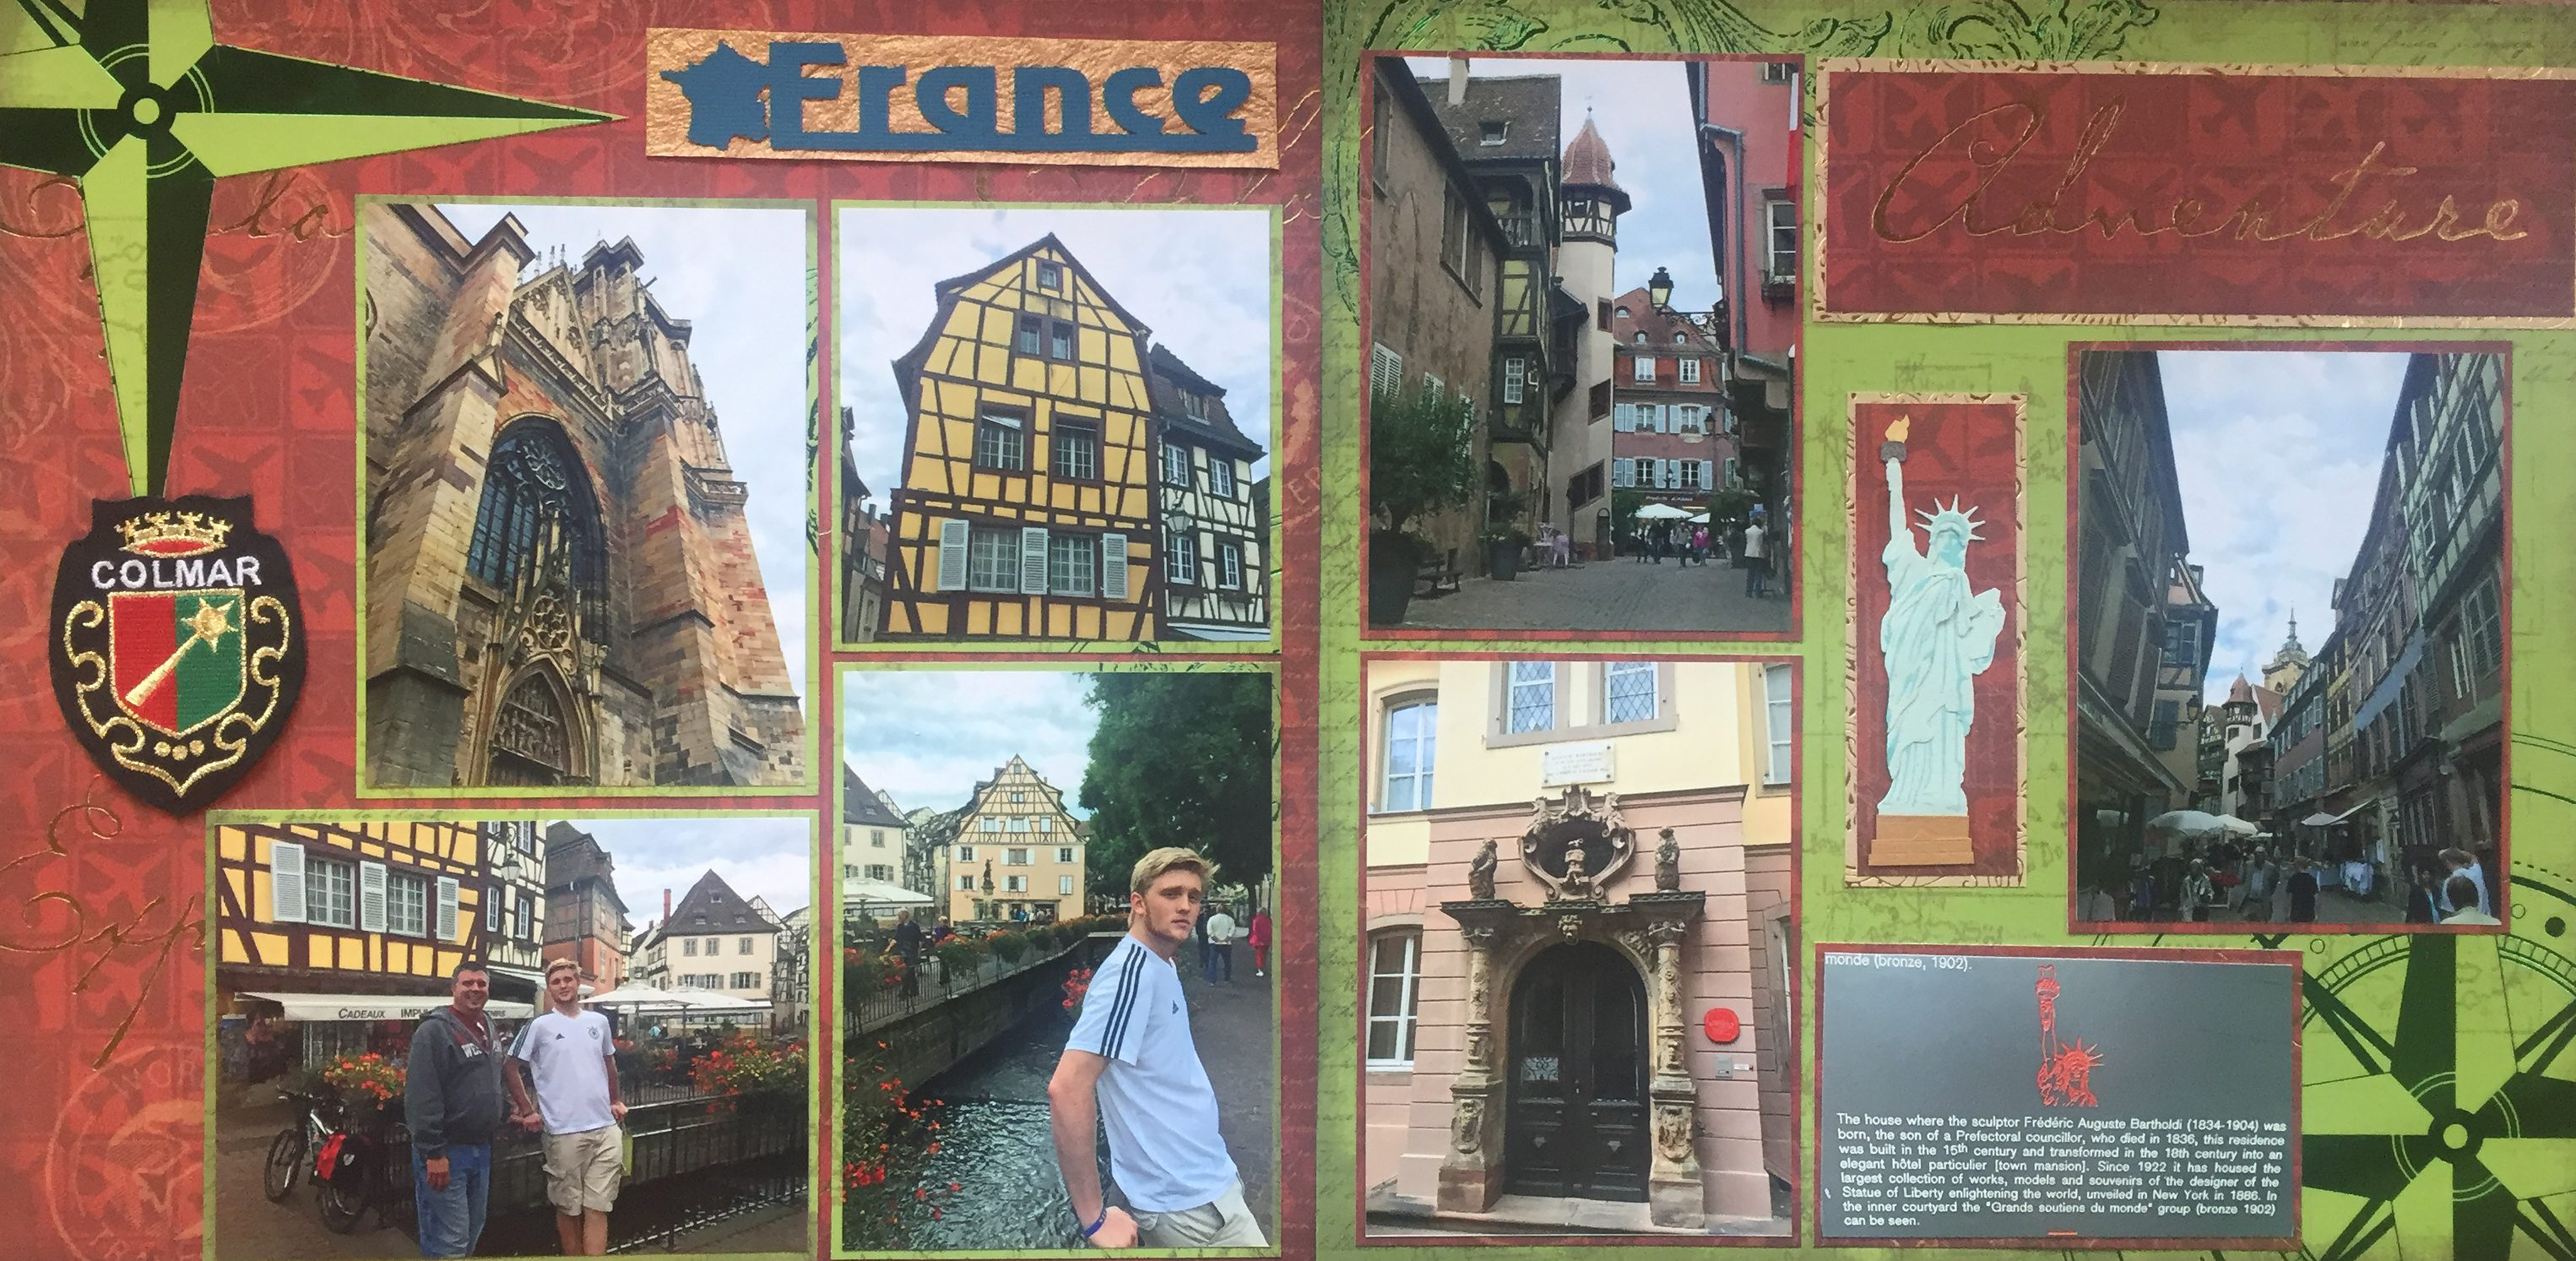 Europe scrapbook ideas - Europe Vacation 2015 Colmar France